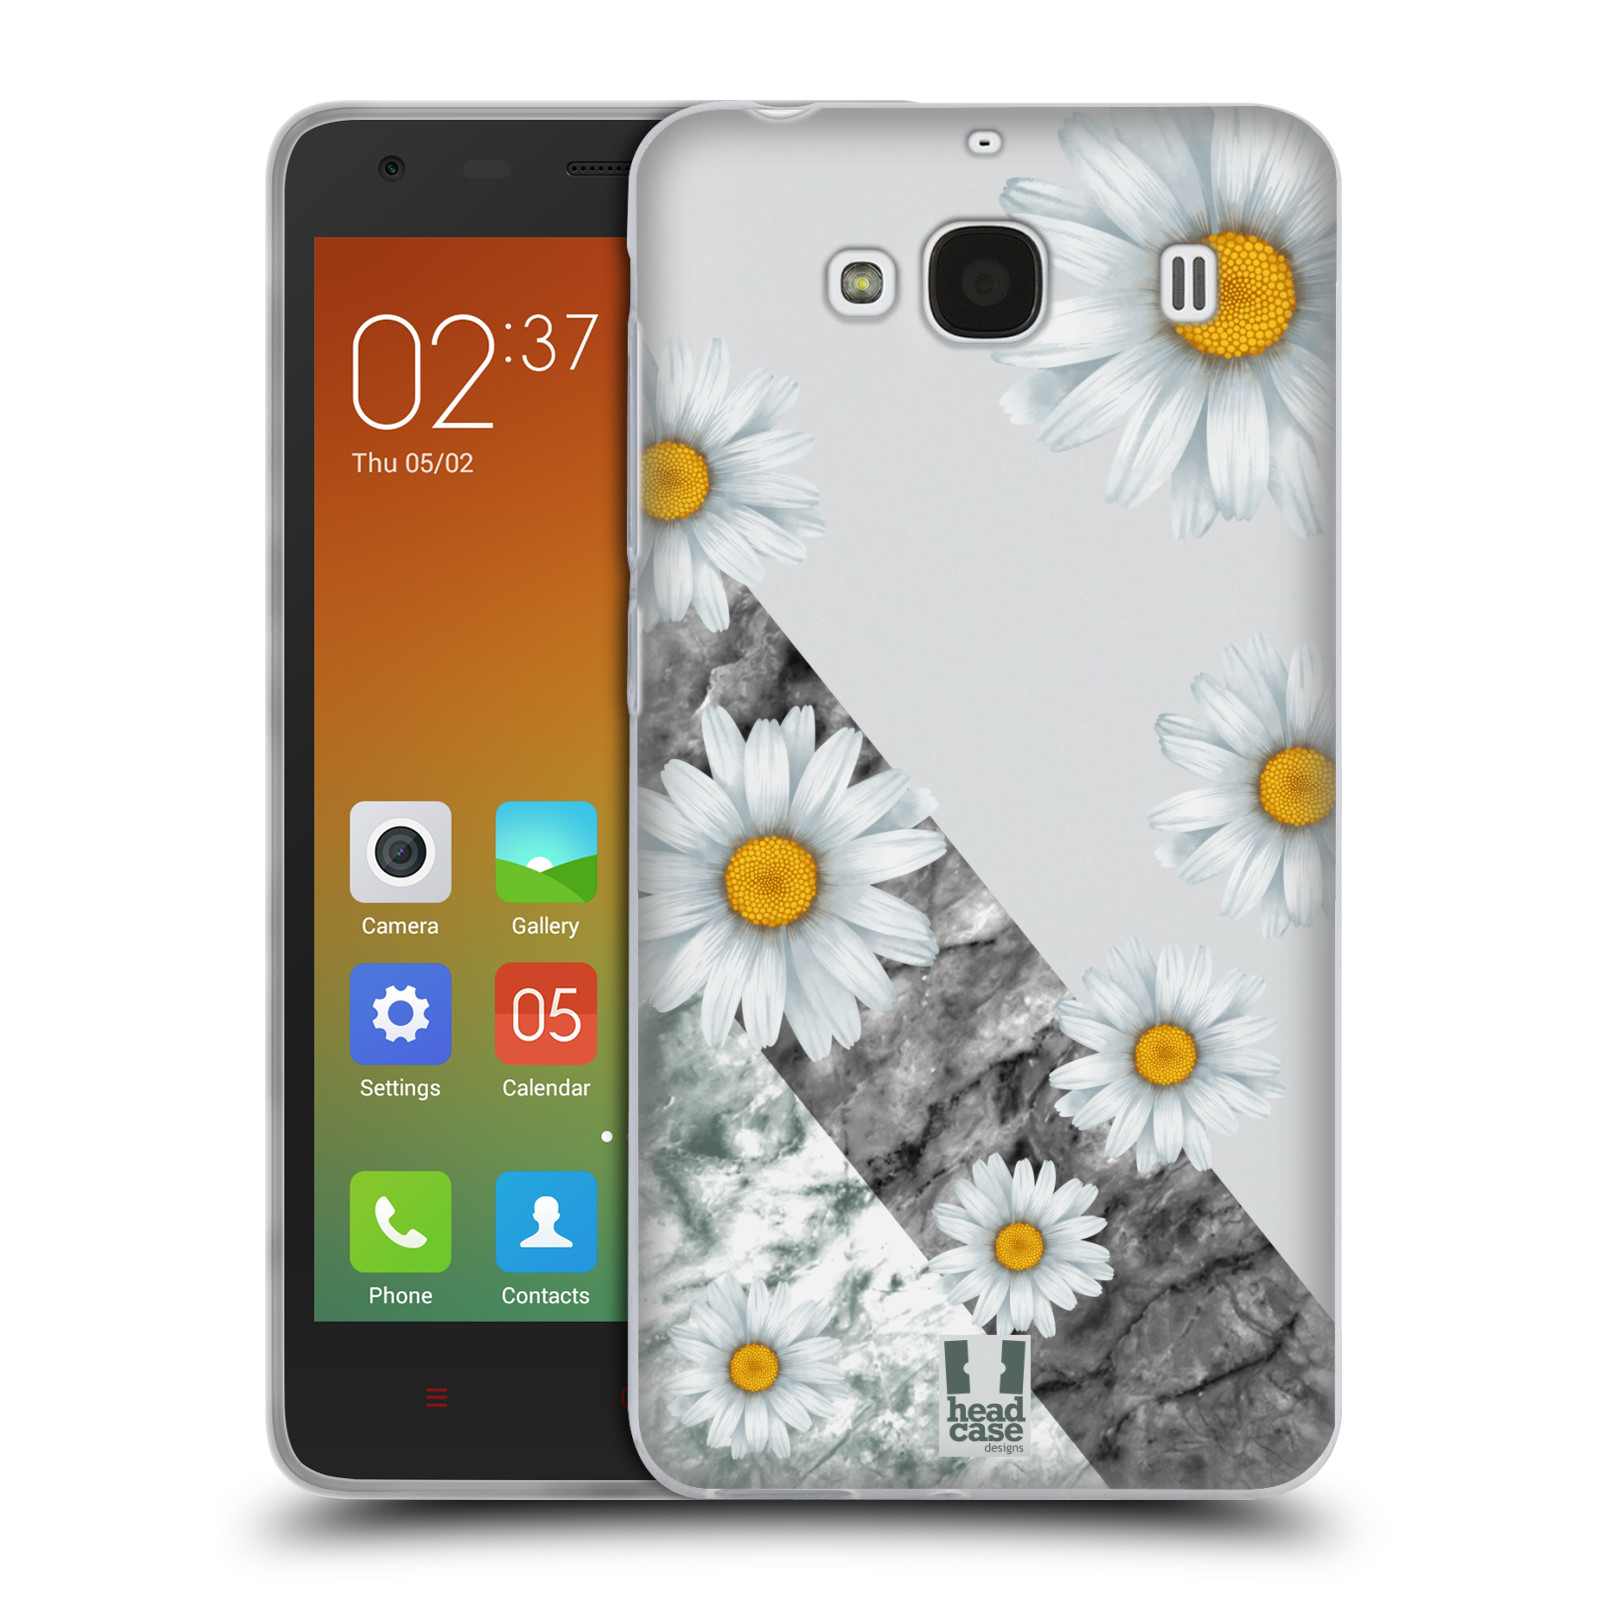 Silikonové pouzdro na mobil Xiaomi Redmi 2 - Head Case - Kopretiny a mramor